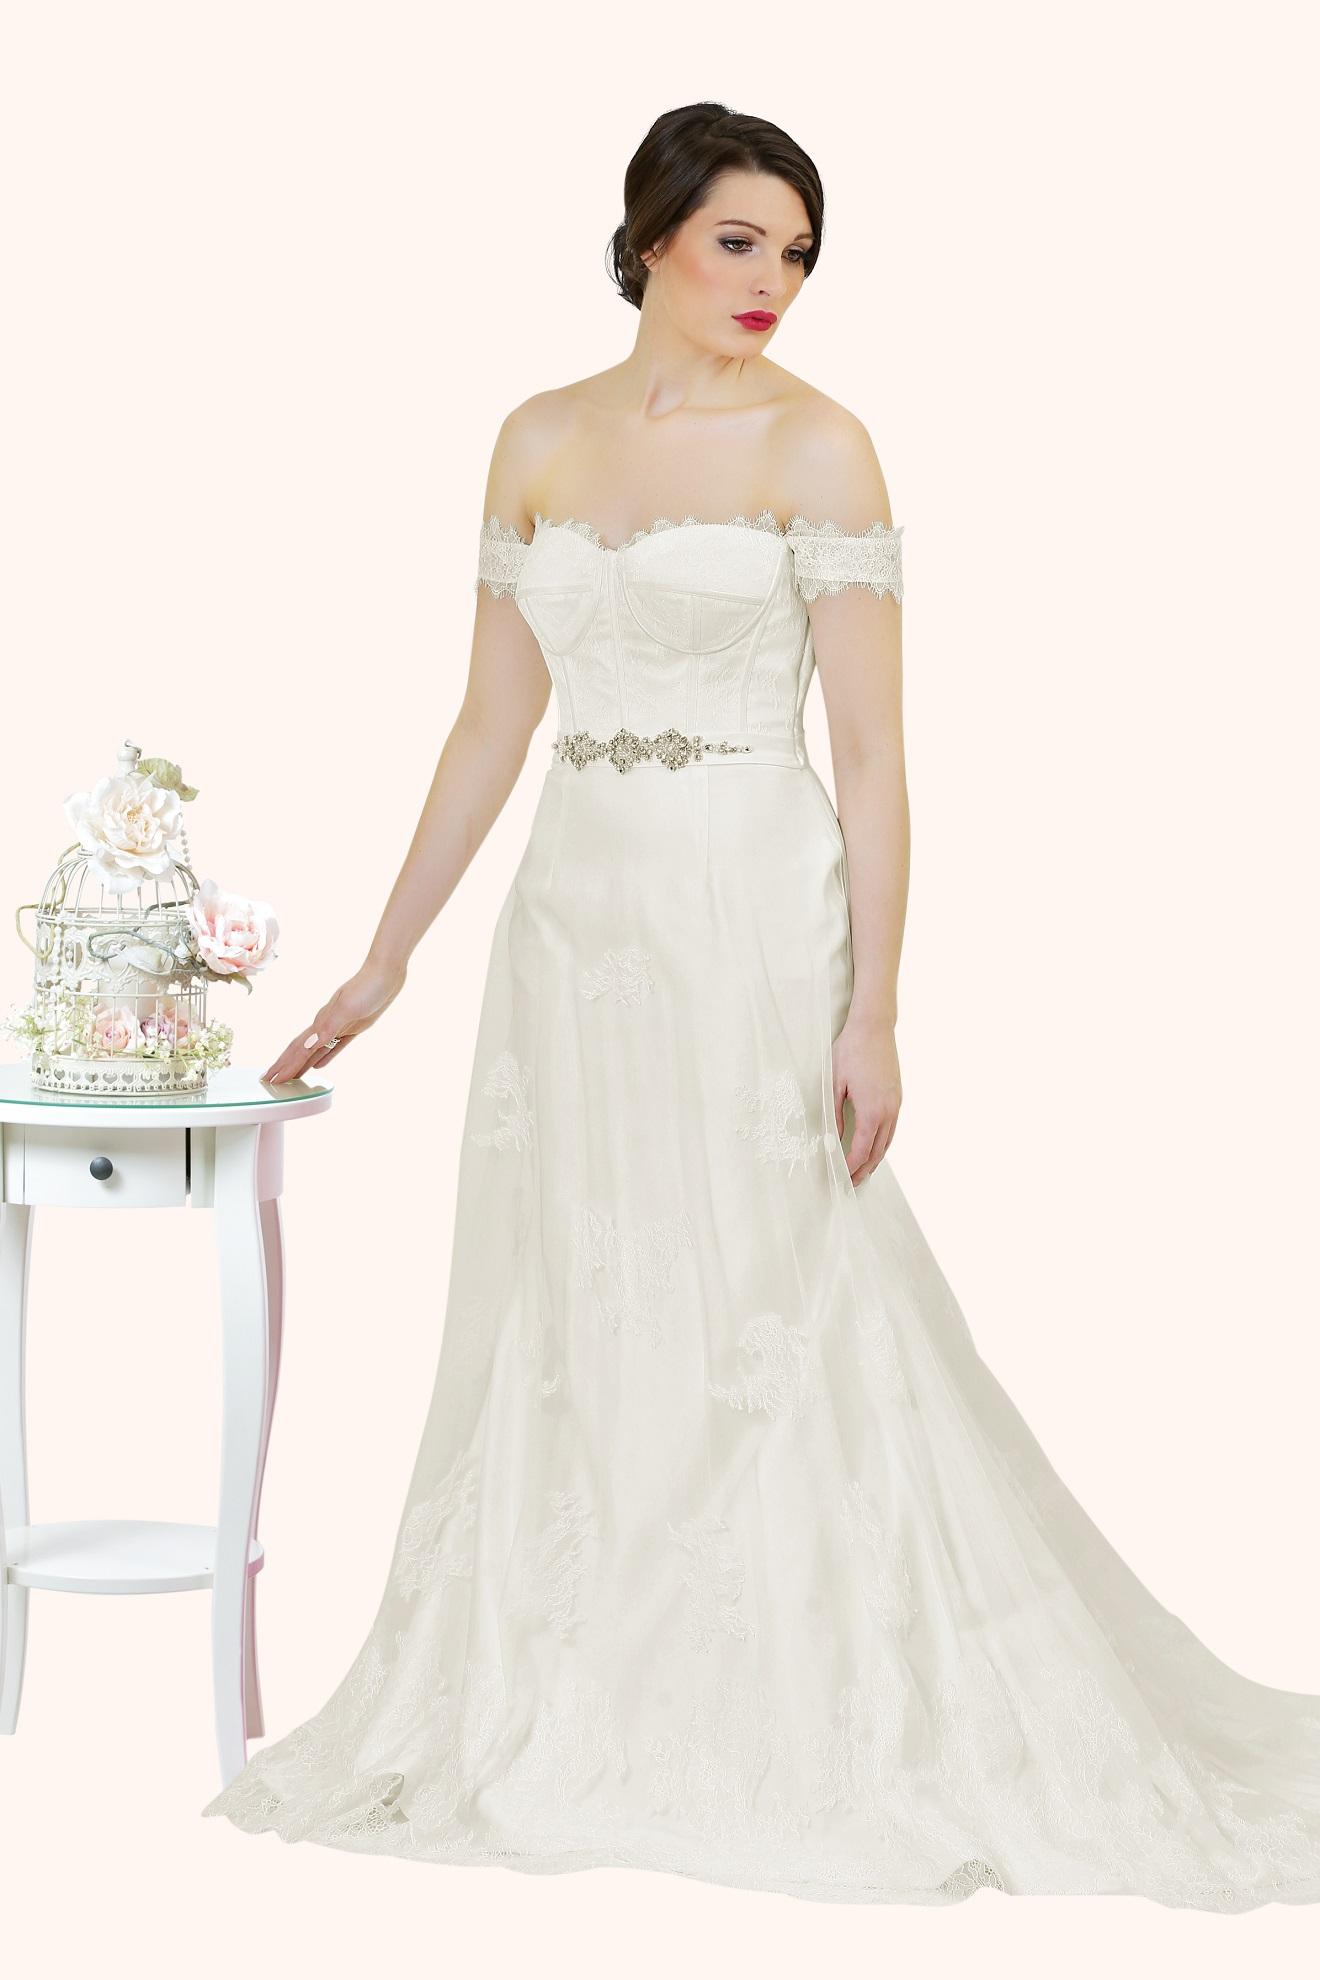 Wedding dresses sale uk wedding dresses in jax wedding dresses sale uk 15 ombrellifo Image collections